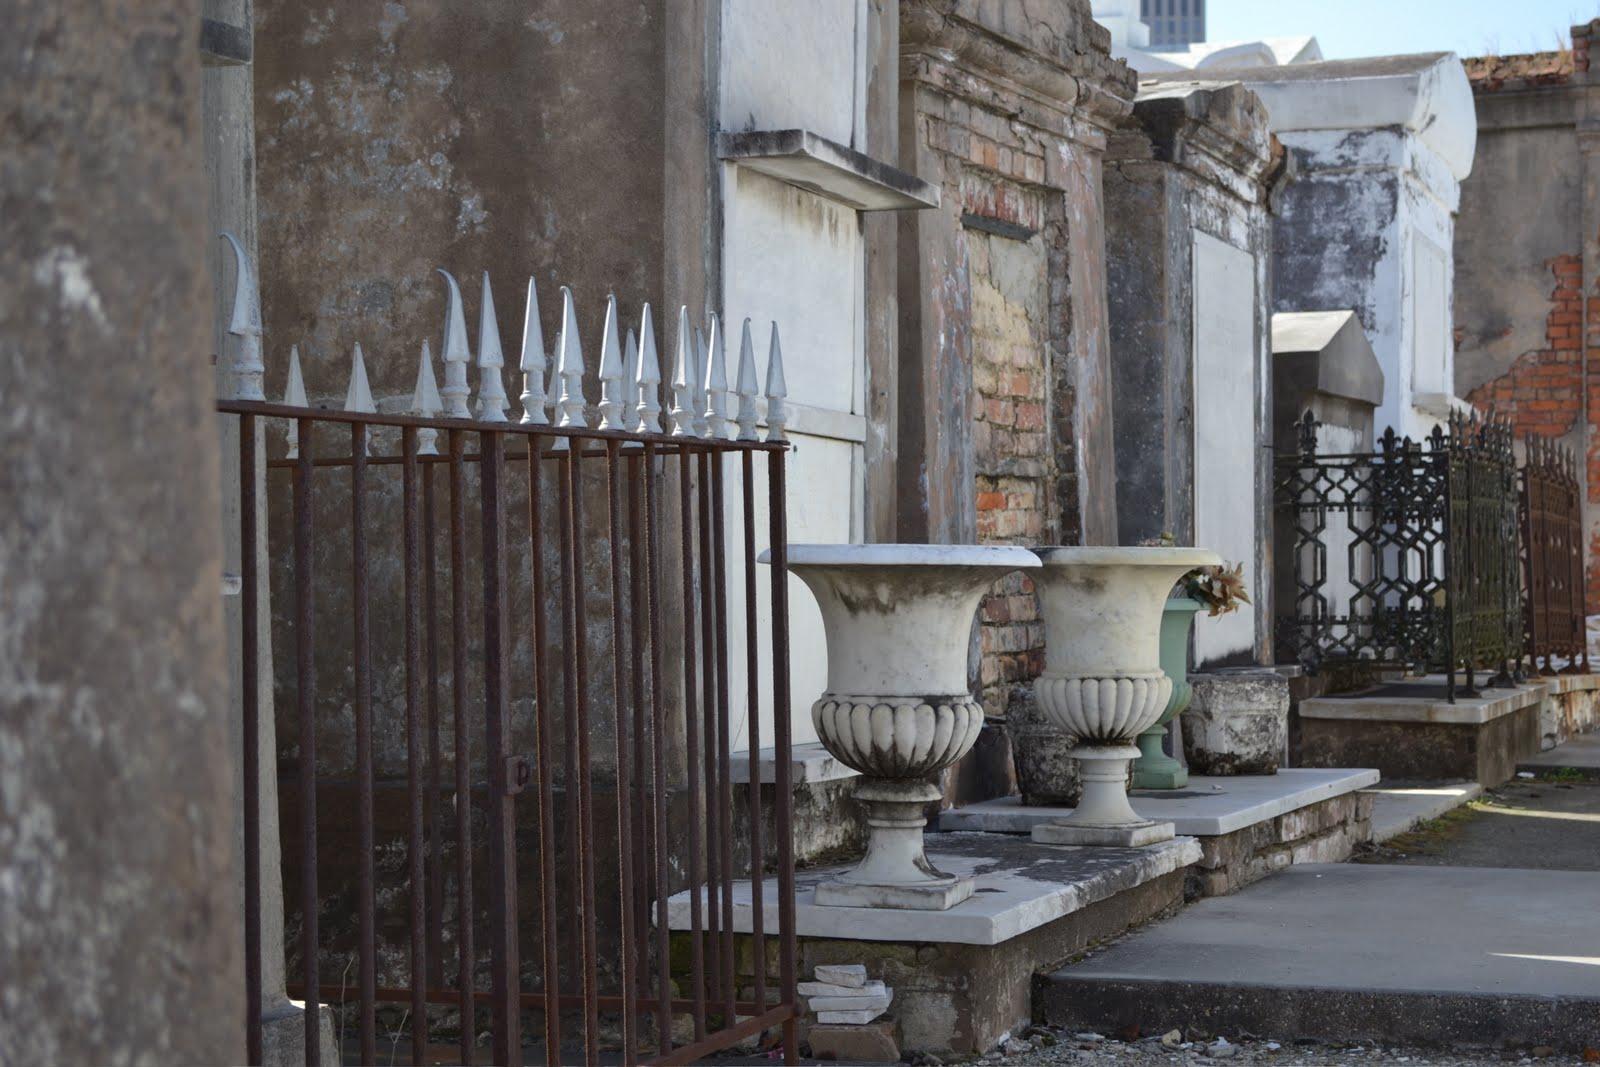 St Louis Cemetery #1